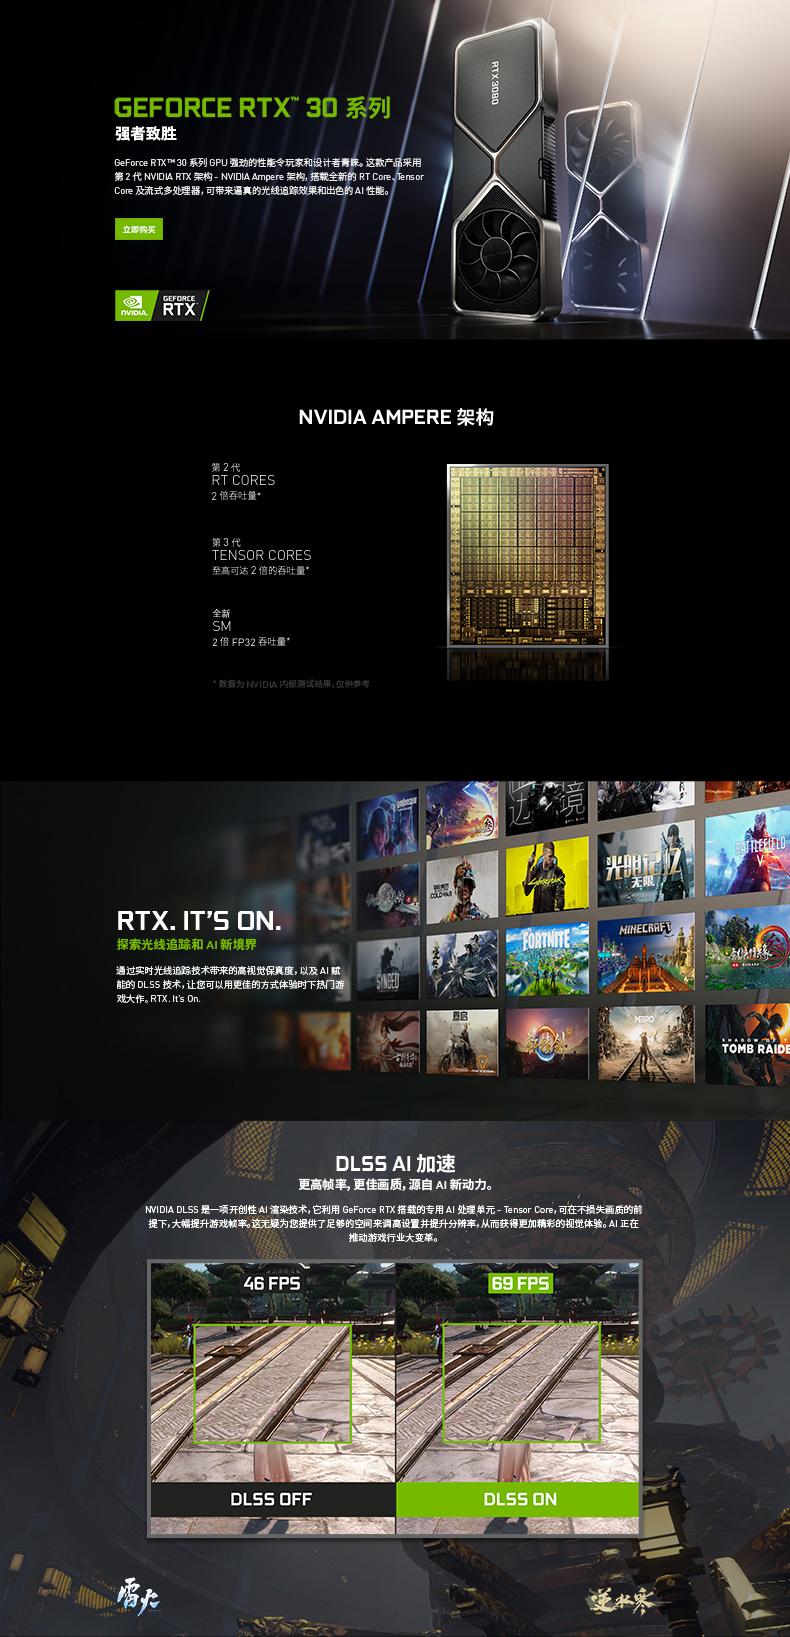 技嘉 Gigabyte Aorus GeForce RTX 3080 Ti Xtreme Waterforce 12GB 分体水雕